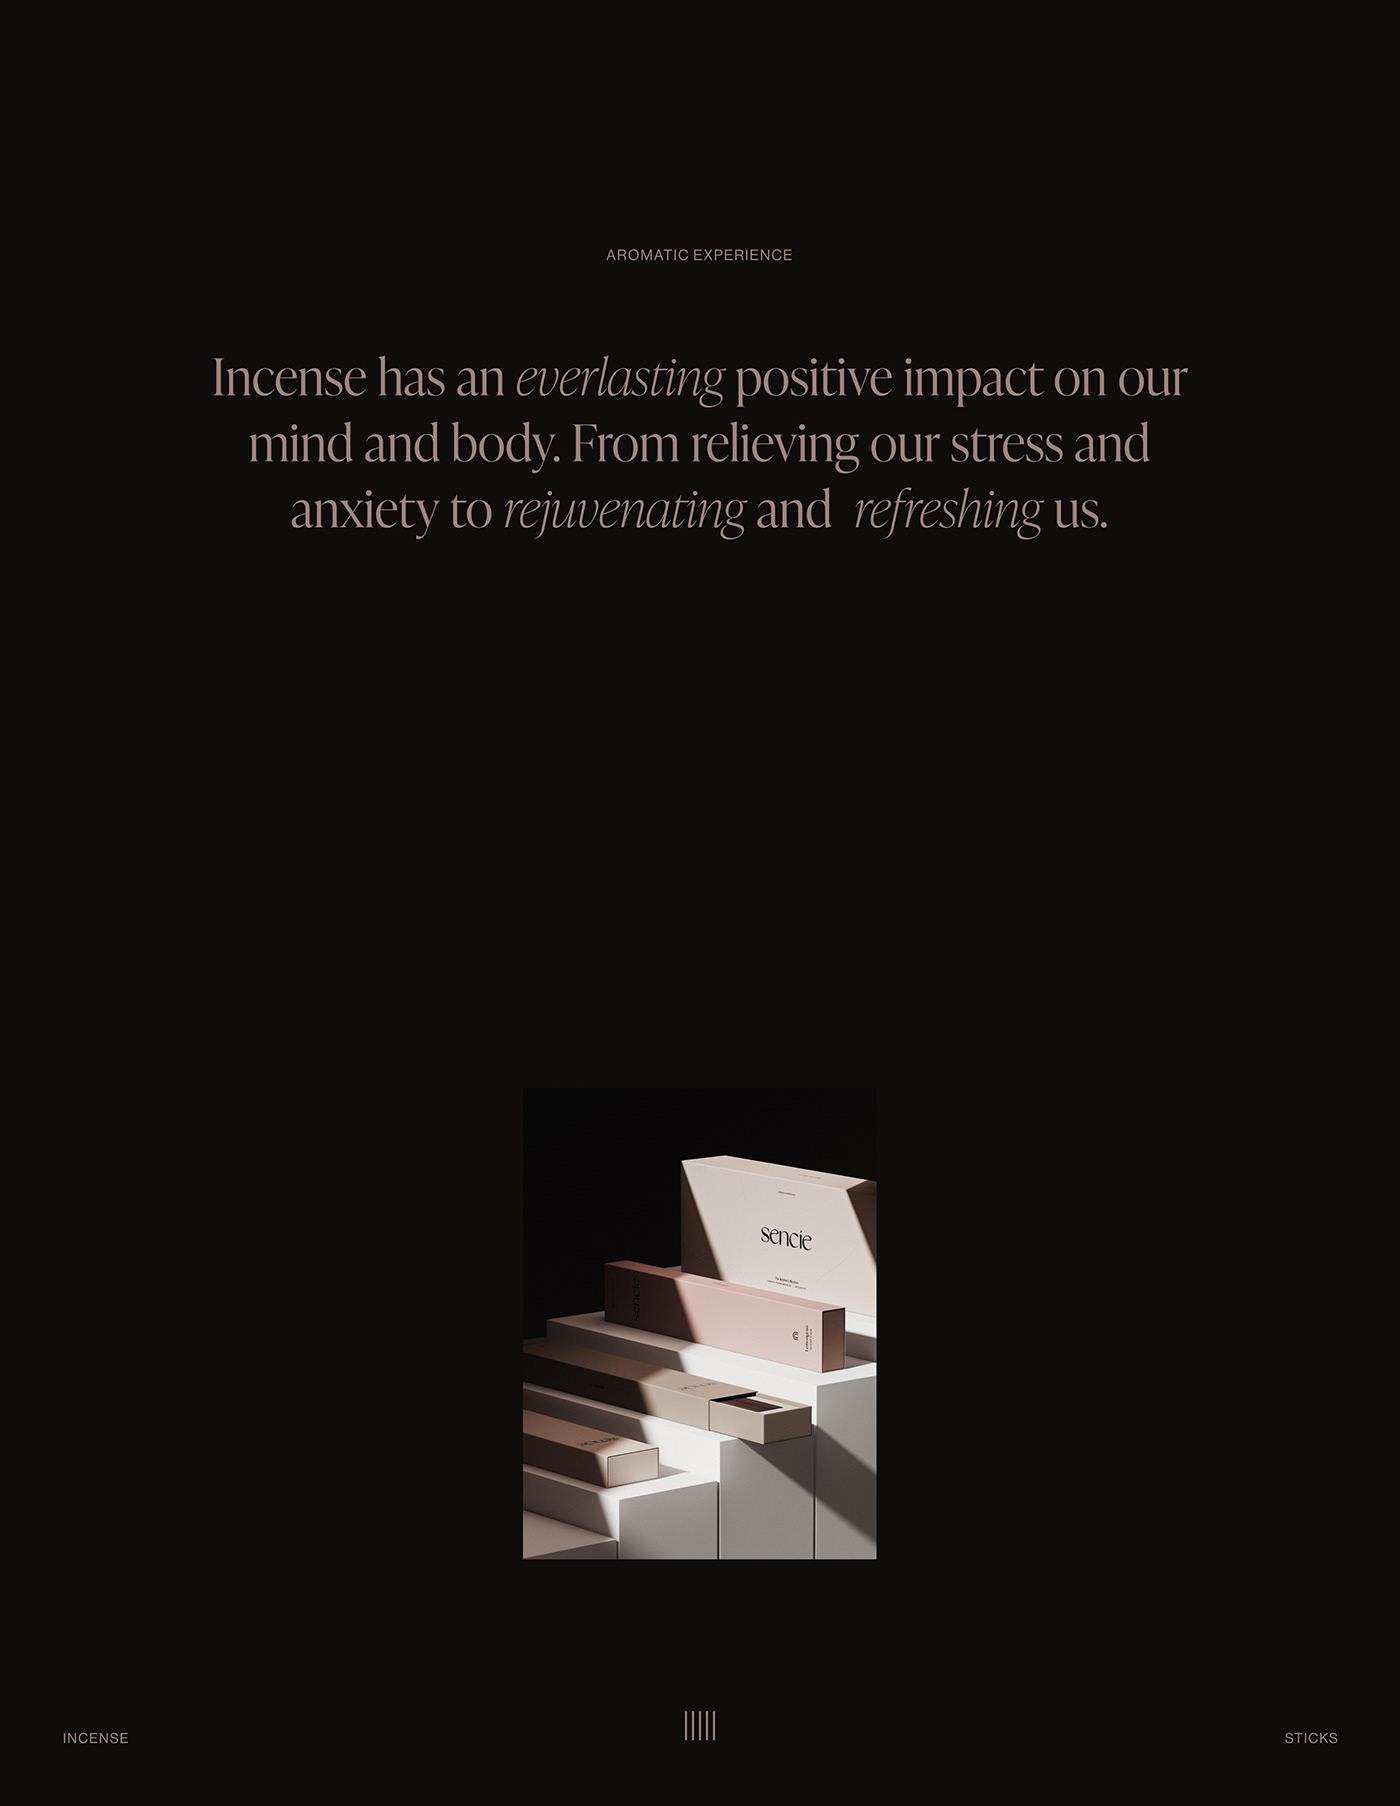 3D animation  branding  natural Packaging product design  graphic design  visual identity premium minimal